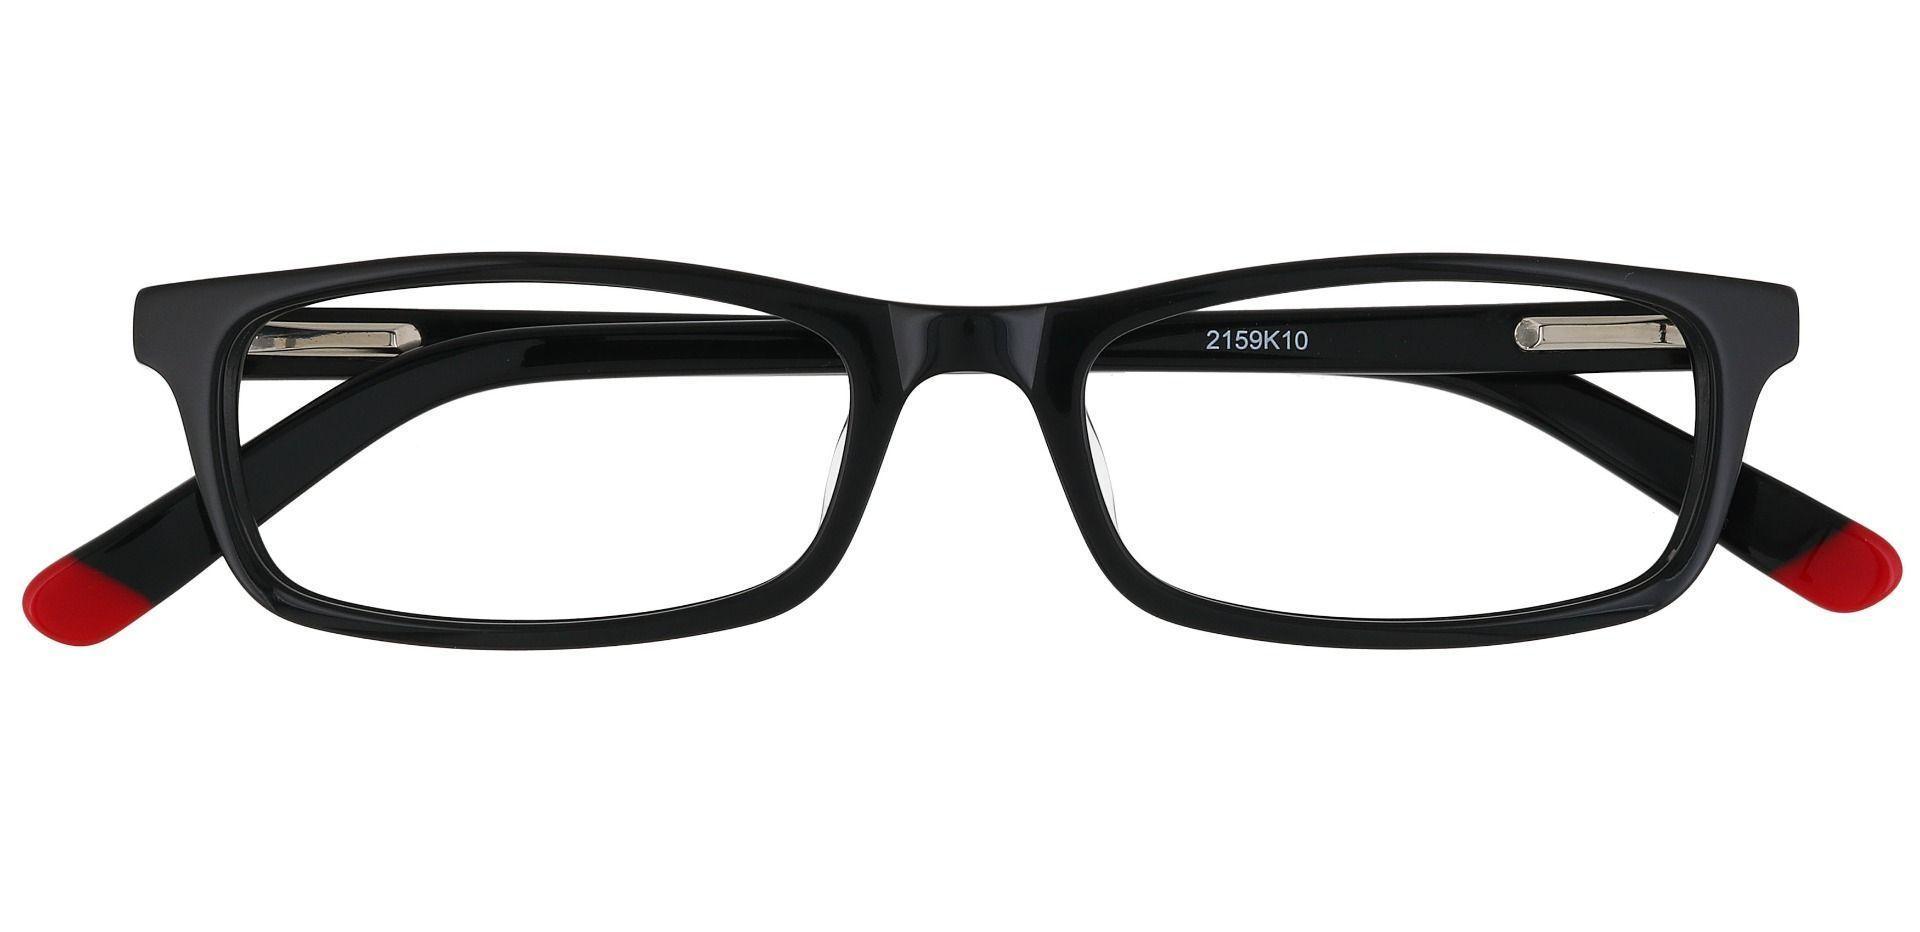 Palisades Rectangle Single Vision Glasses - Black